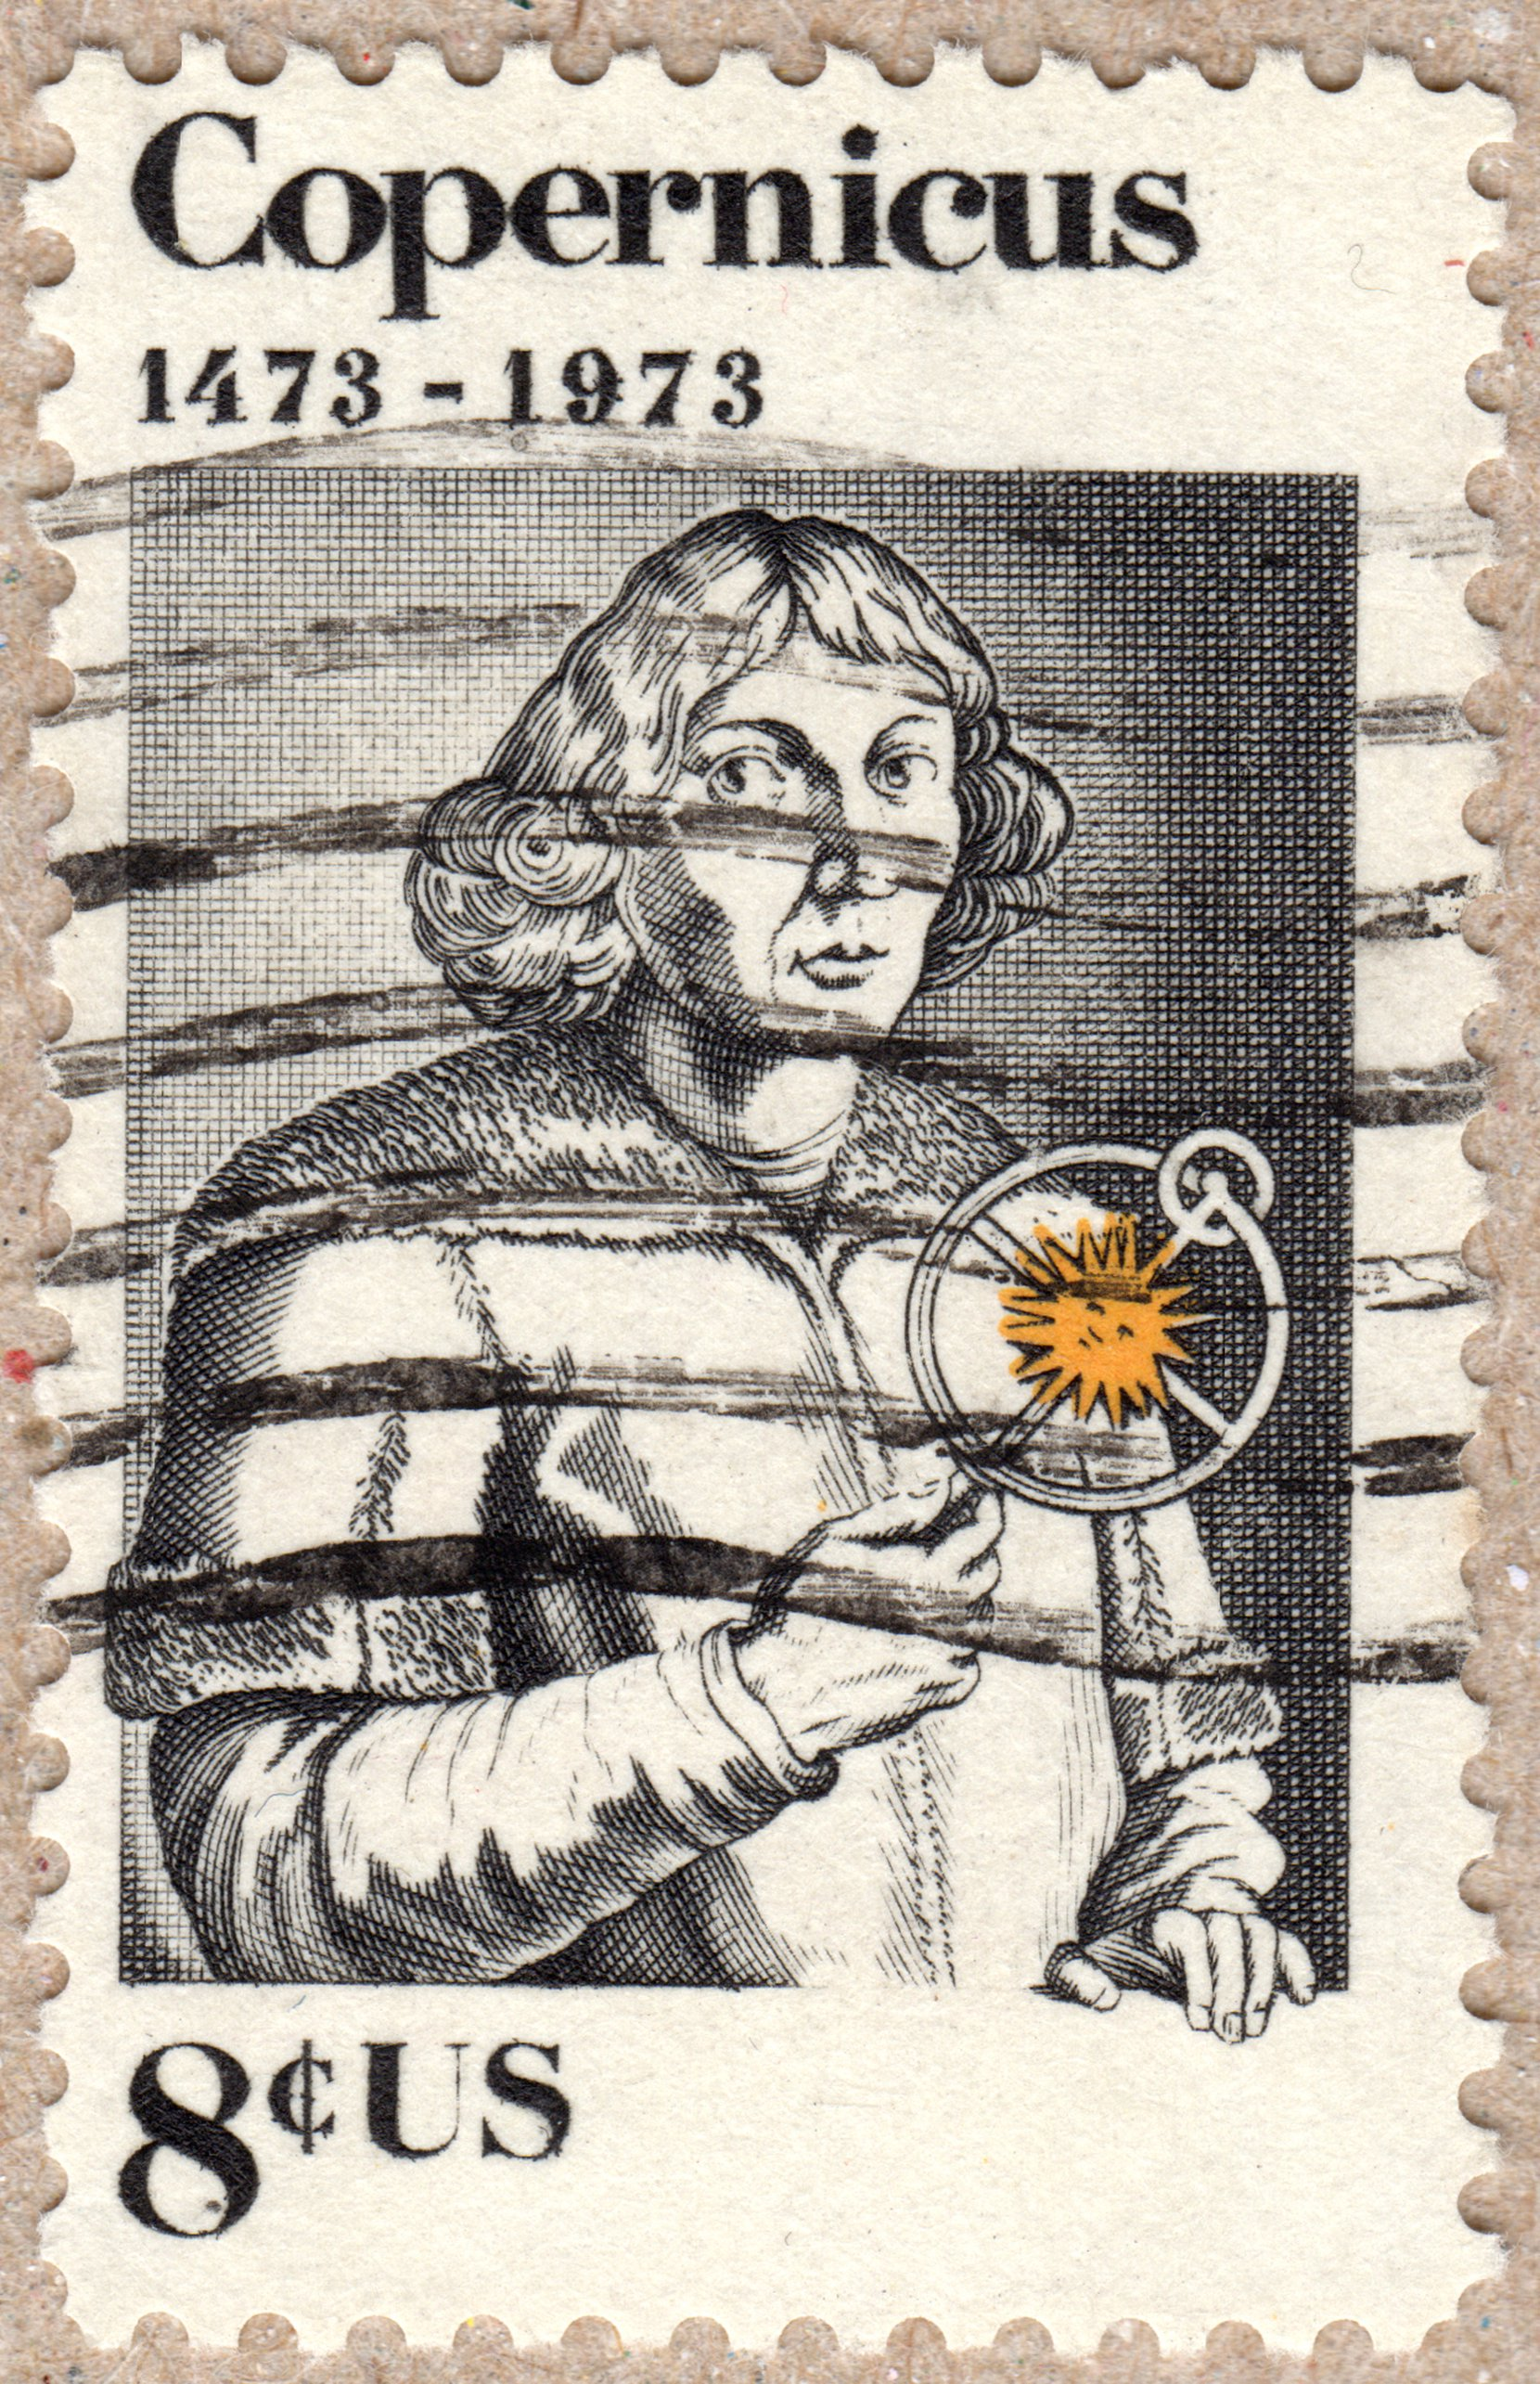 copernicus (1473-1973), 8¢ u.s. postage stamp philately postage stamps